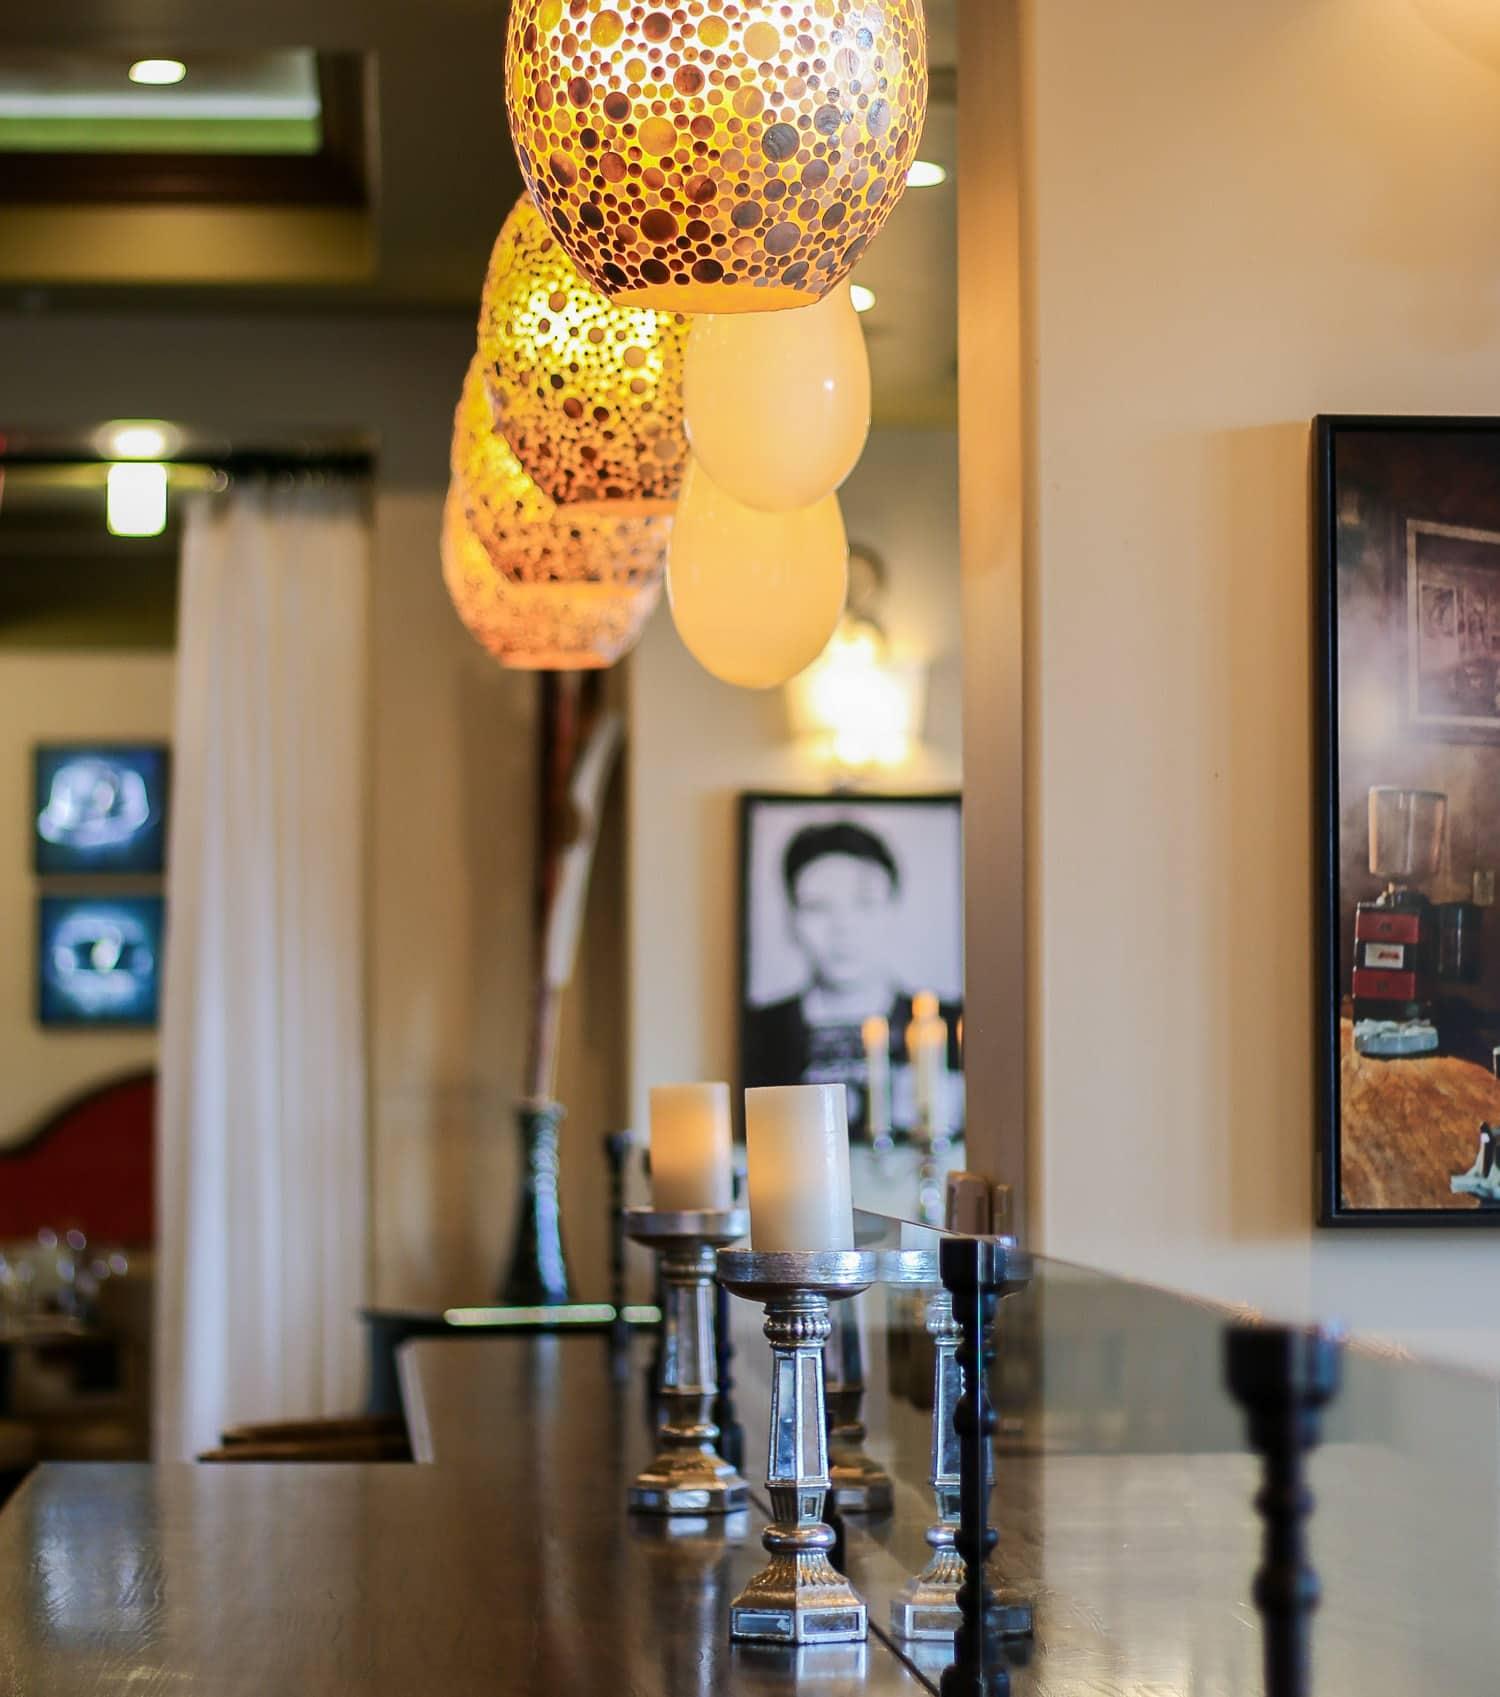 the-pearl-hotel-rosemary-havana-beach-grille-0520